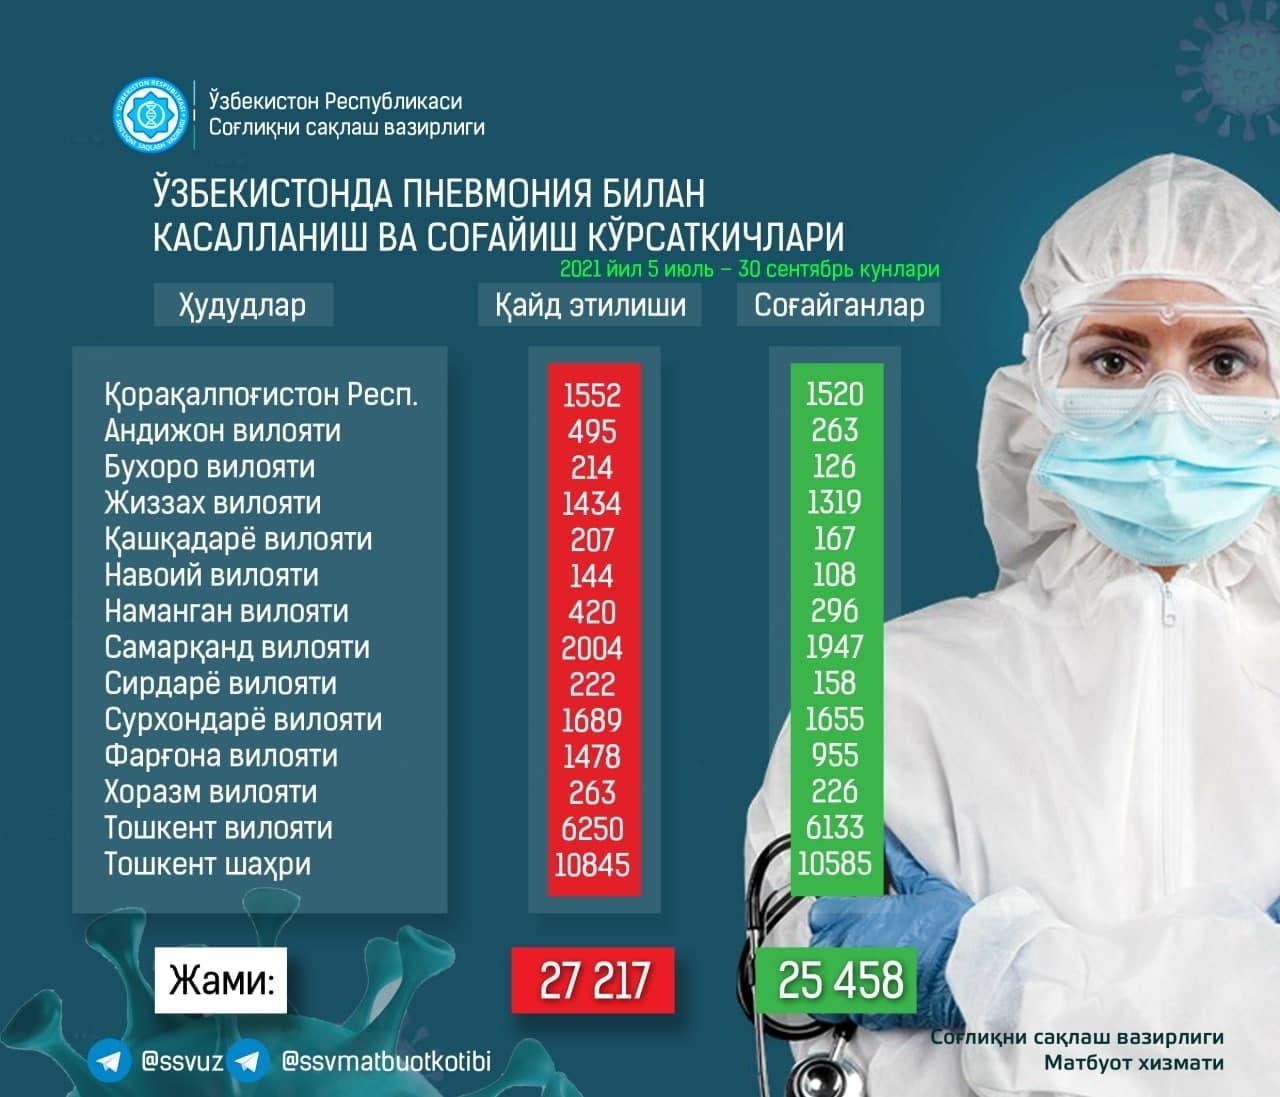 Почти 70 человек заболели пневмонией за сутки — статистика